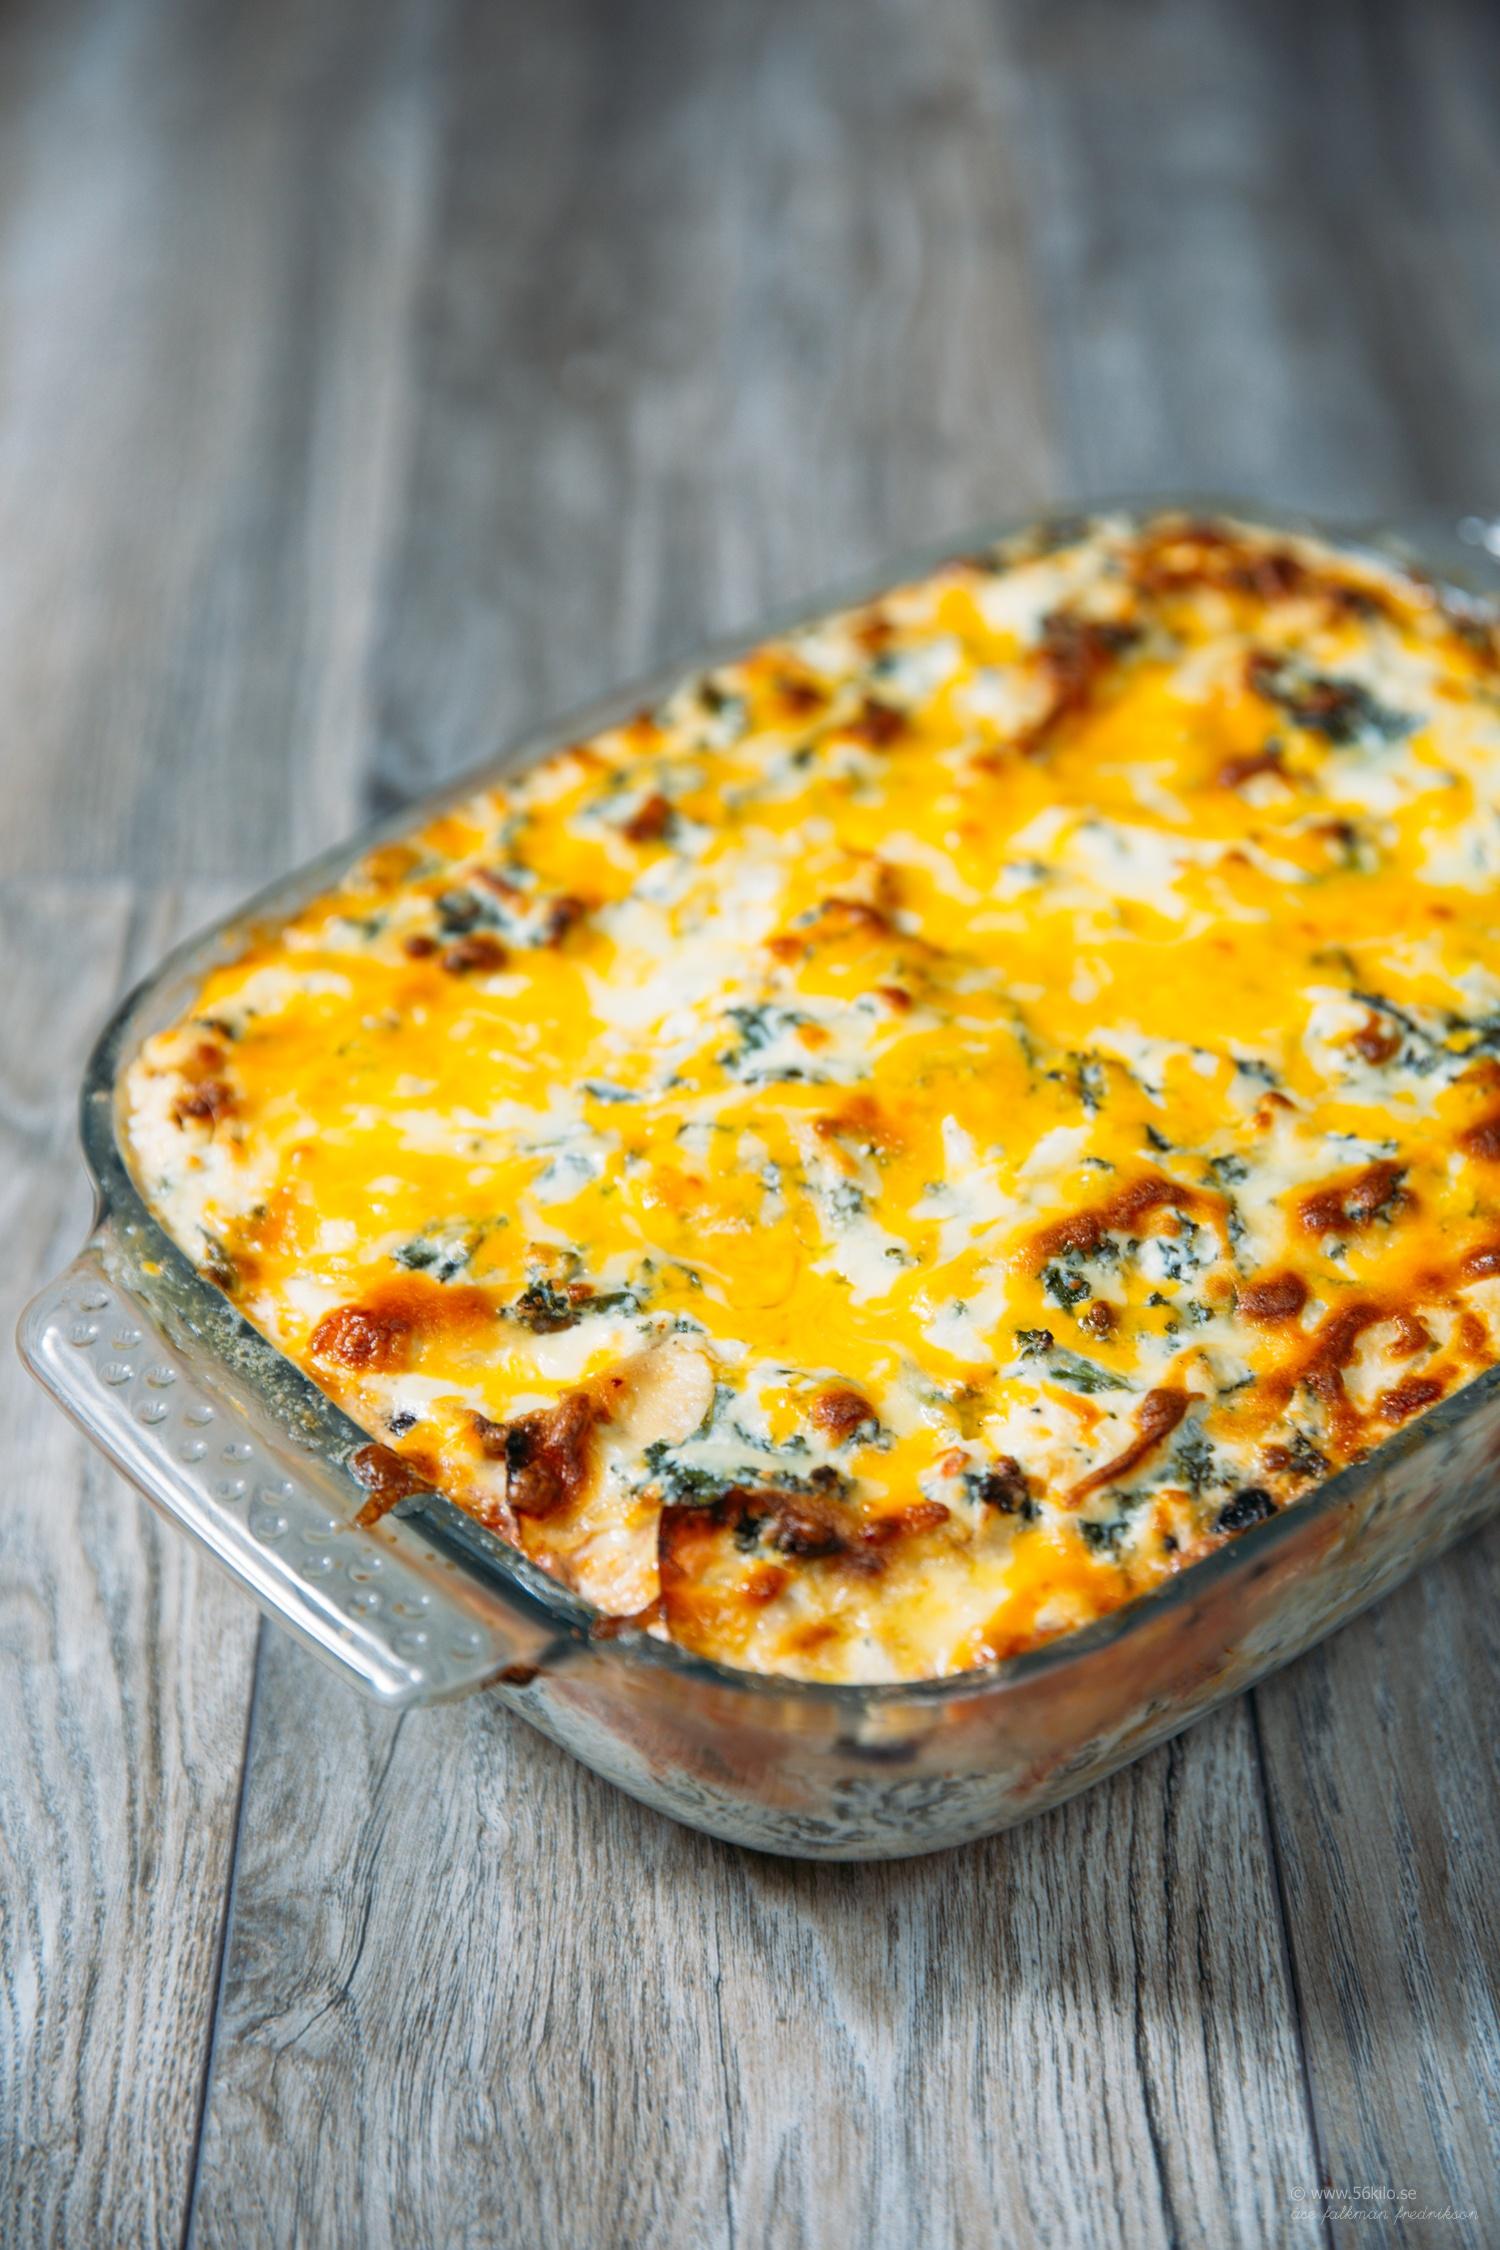 lchf lasagne 56kilo